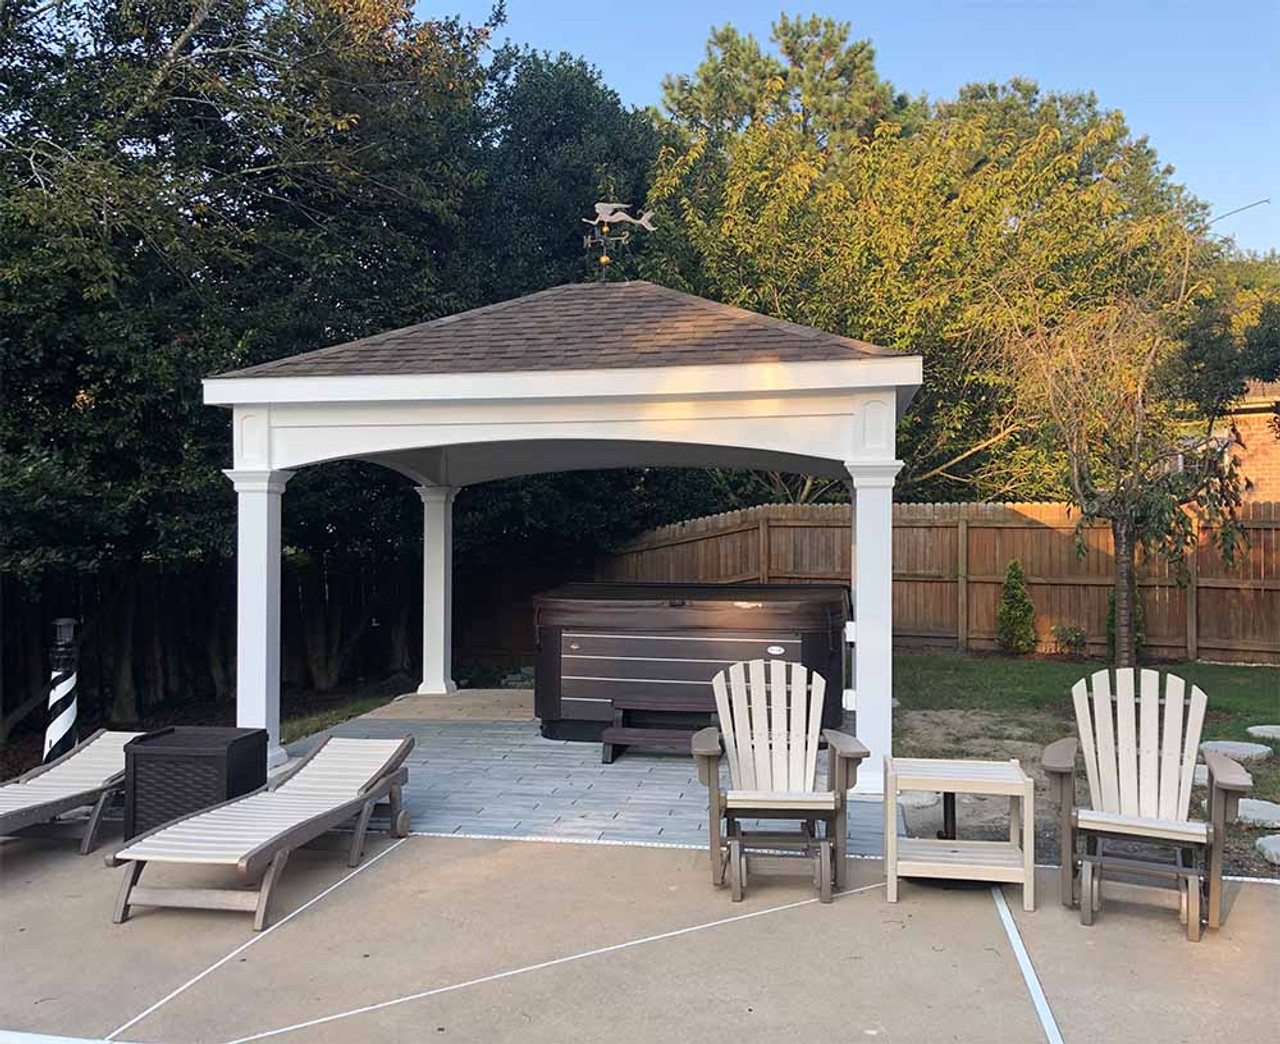 12x14 Traditional (Hip) Vinyl Pavilion at Sunset Chesapeake, Virginia